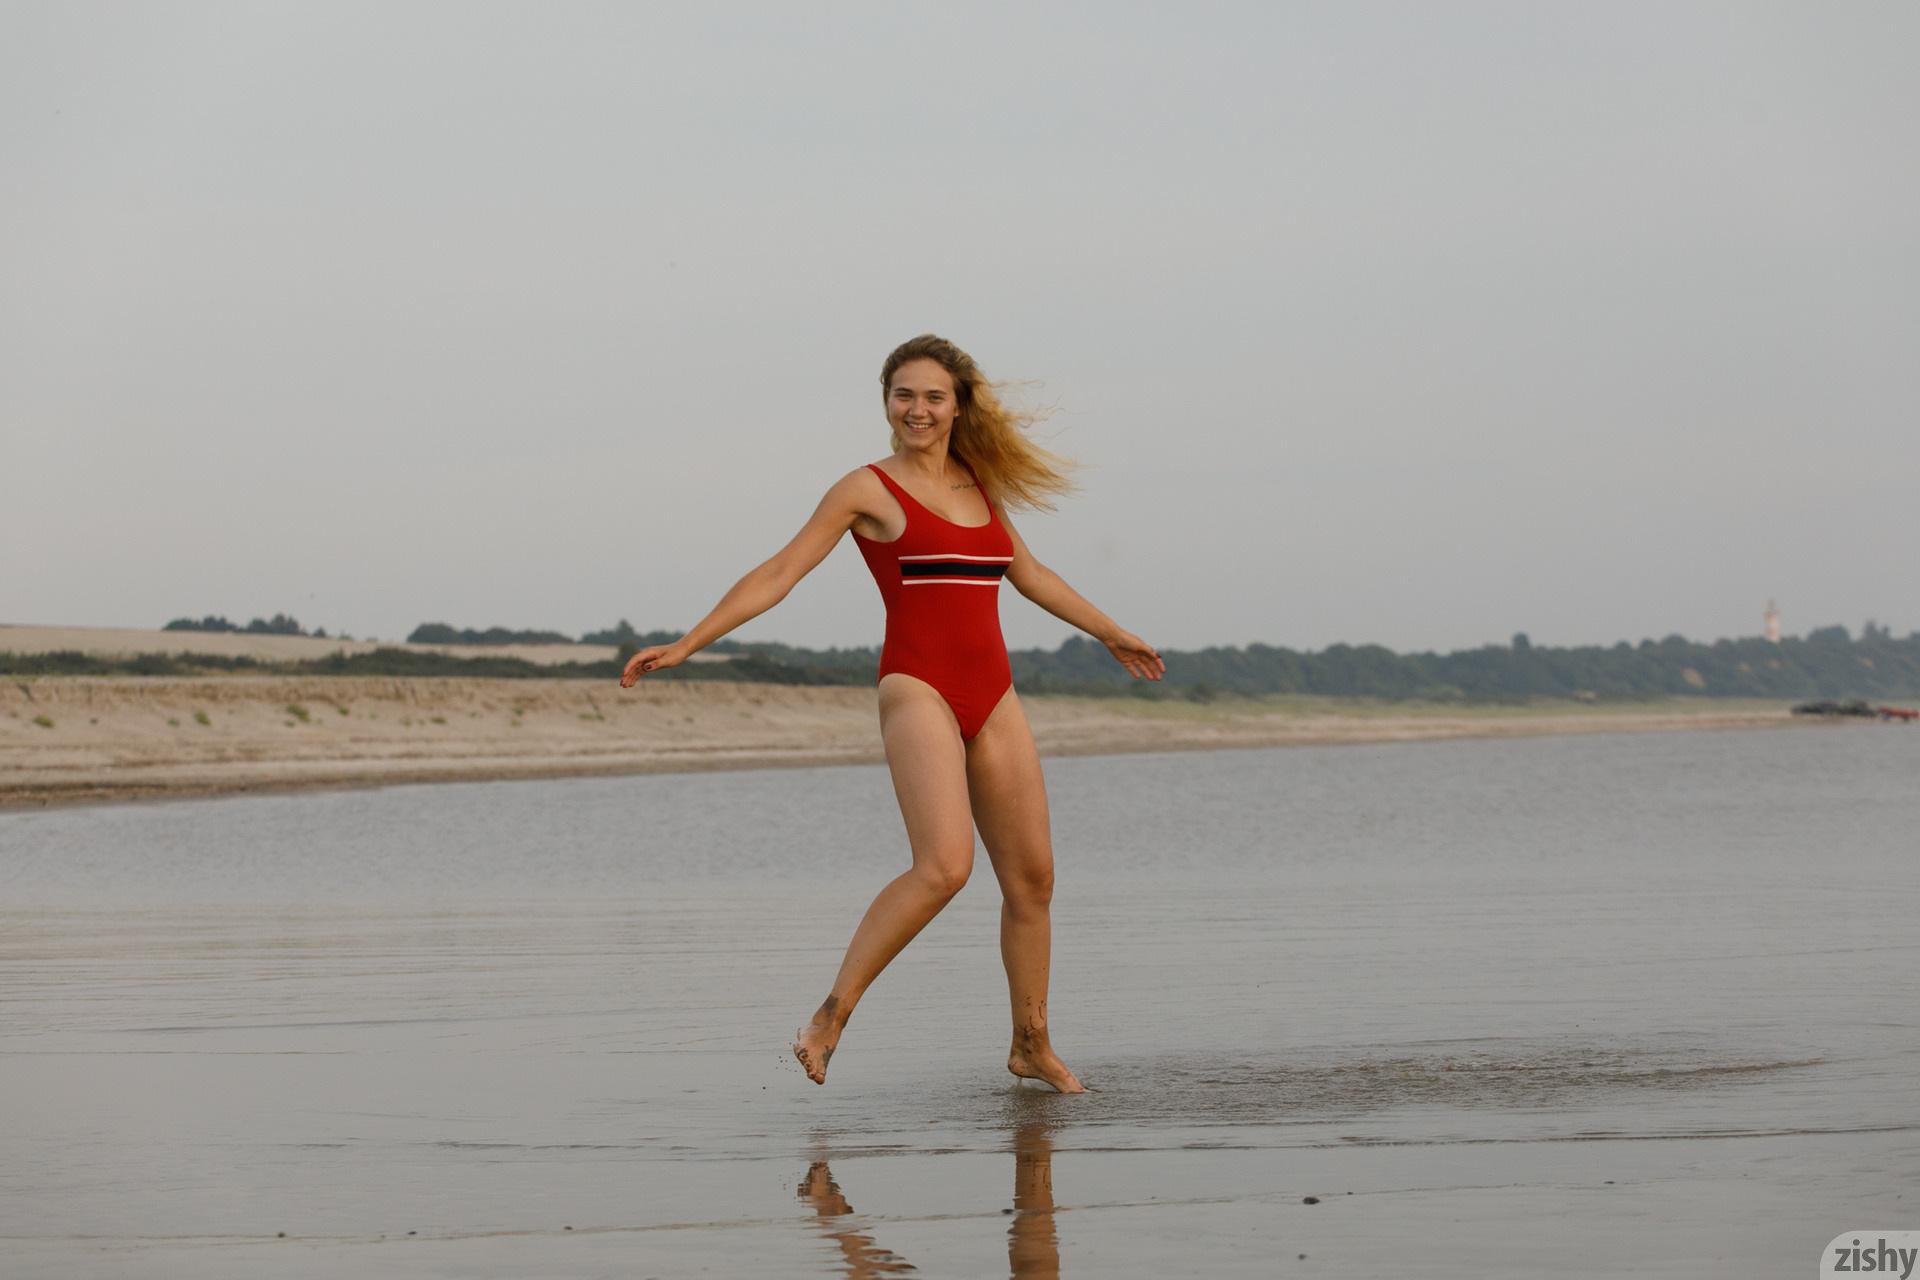 Sofia Orlova On Gryaznyy Beach Zishy (2)